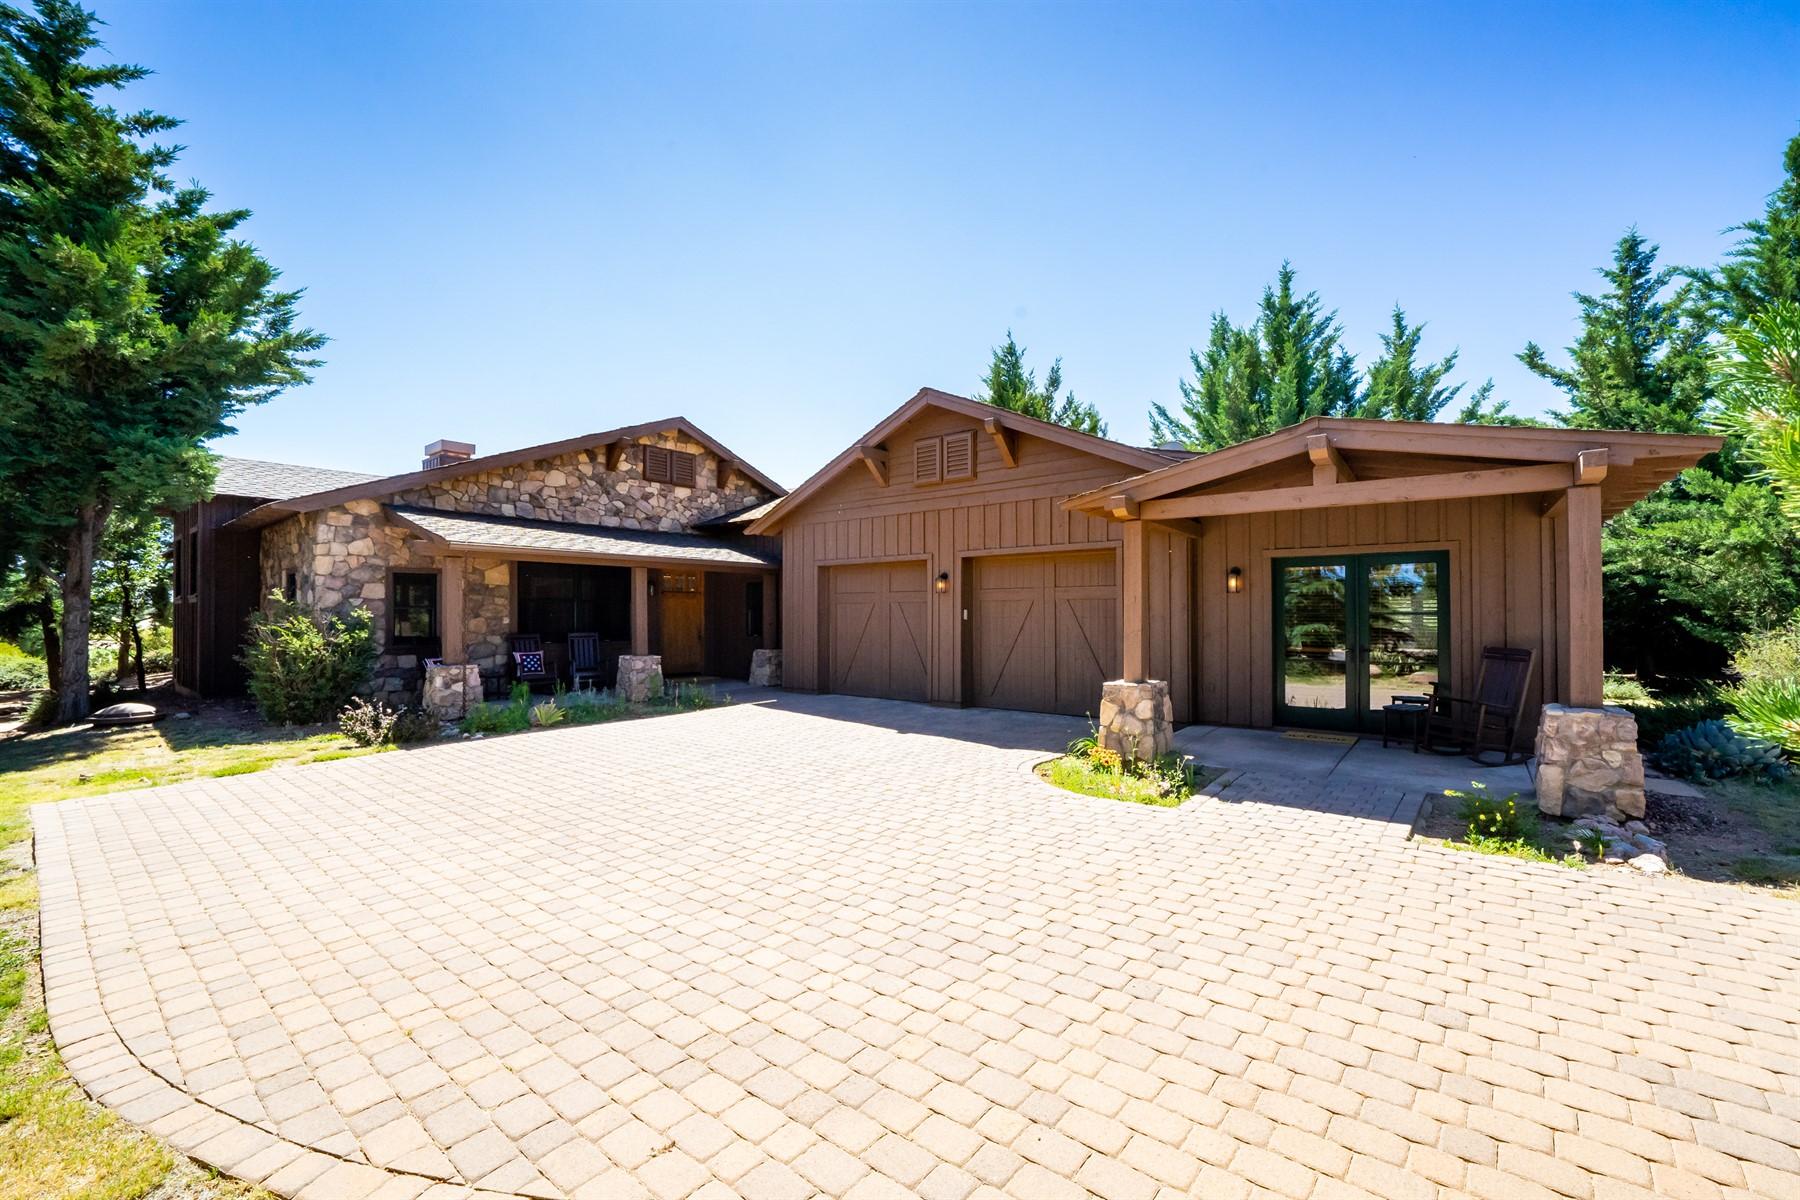 Single Family Homes for Sale at Talking Rock 11765 W Lost Man Canyon Way Prescott, Arizona 86305 United States